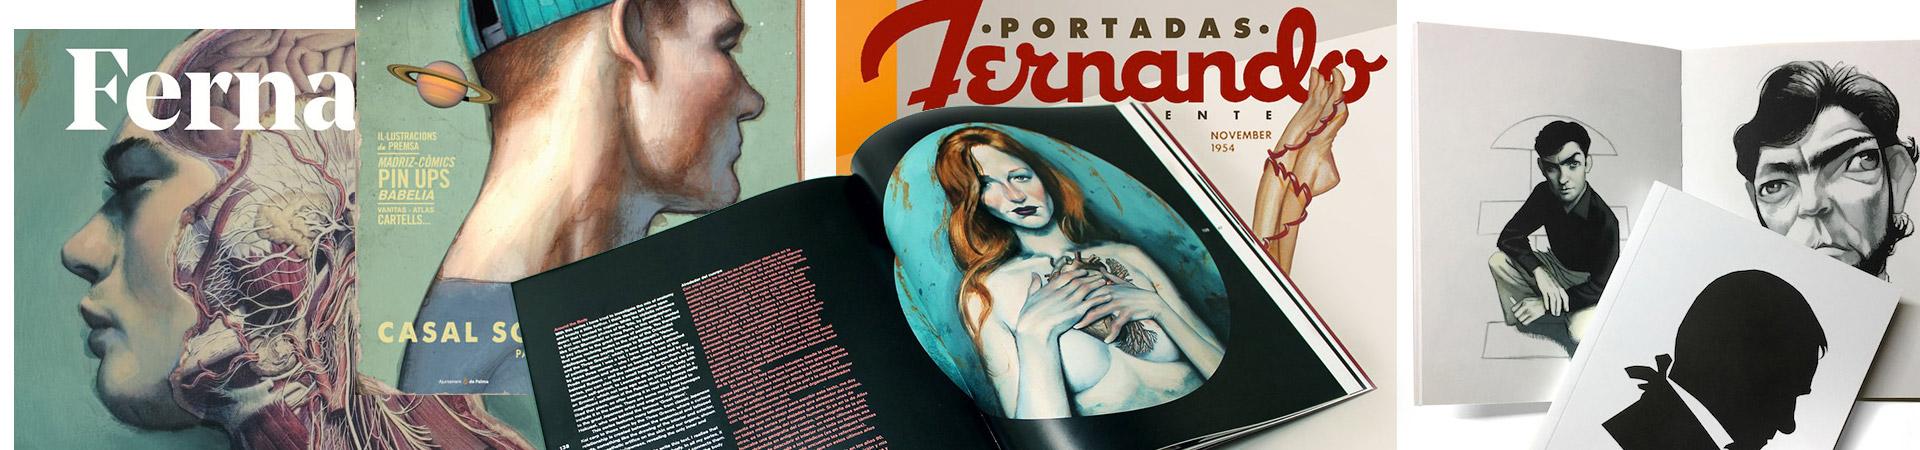 Libros -Books Fernando Vicente Tienda Online